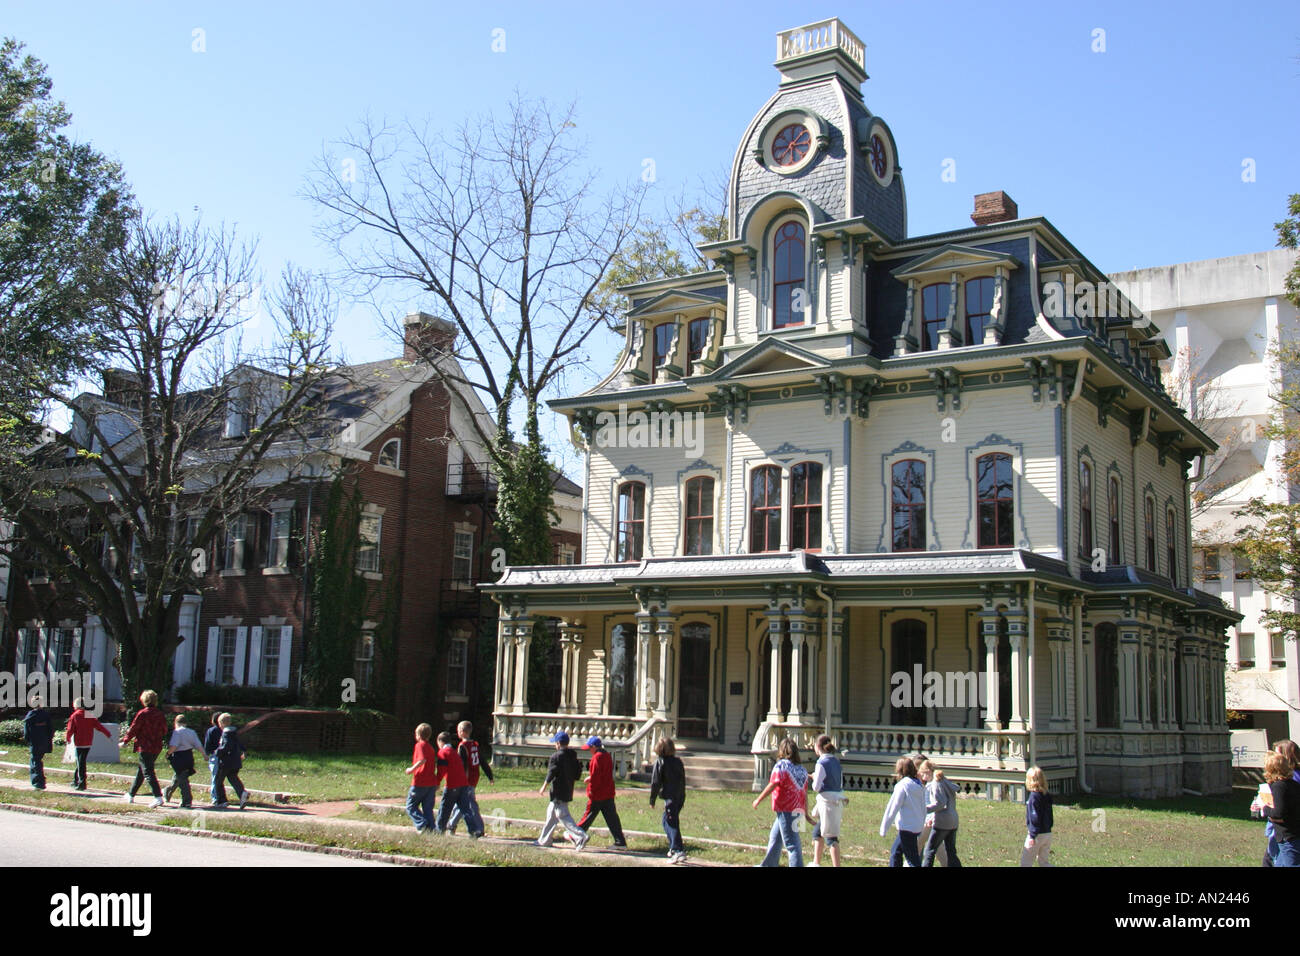 Raleigh North Carolina Blount Street historic Victorian style home Stock Photo